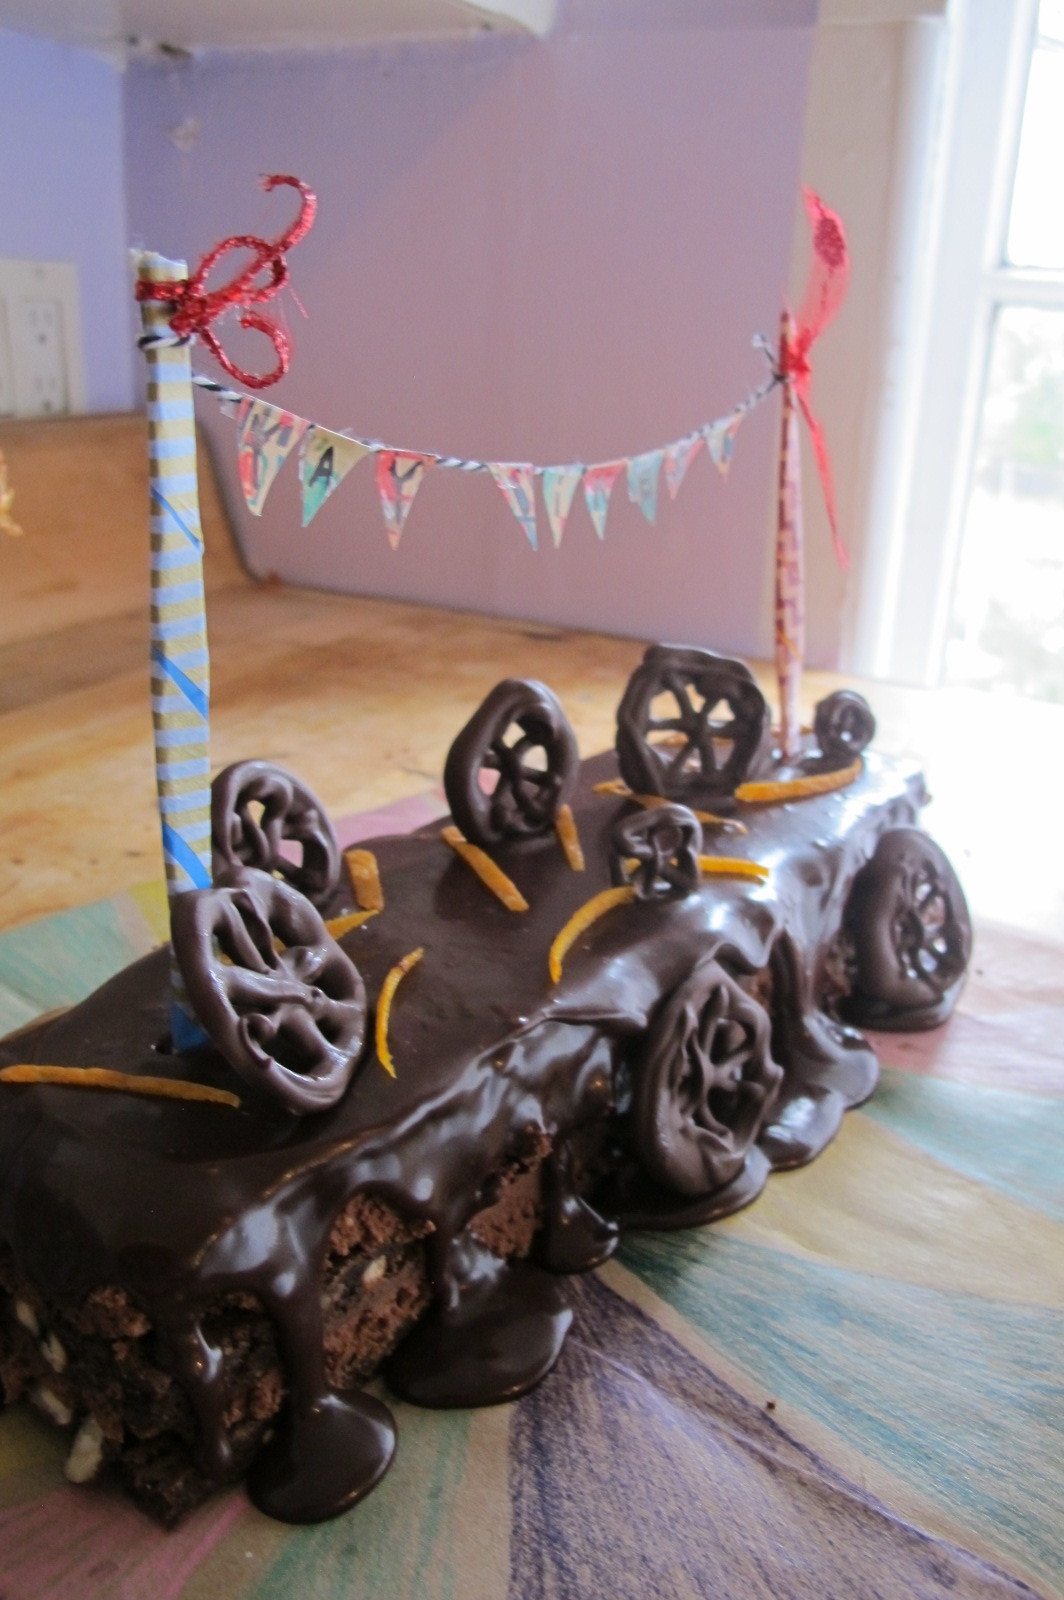 Elaborate homemade birthday cakes